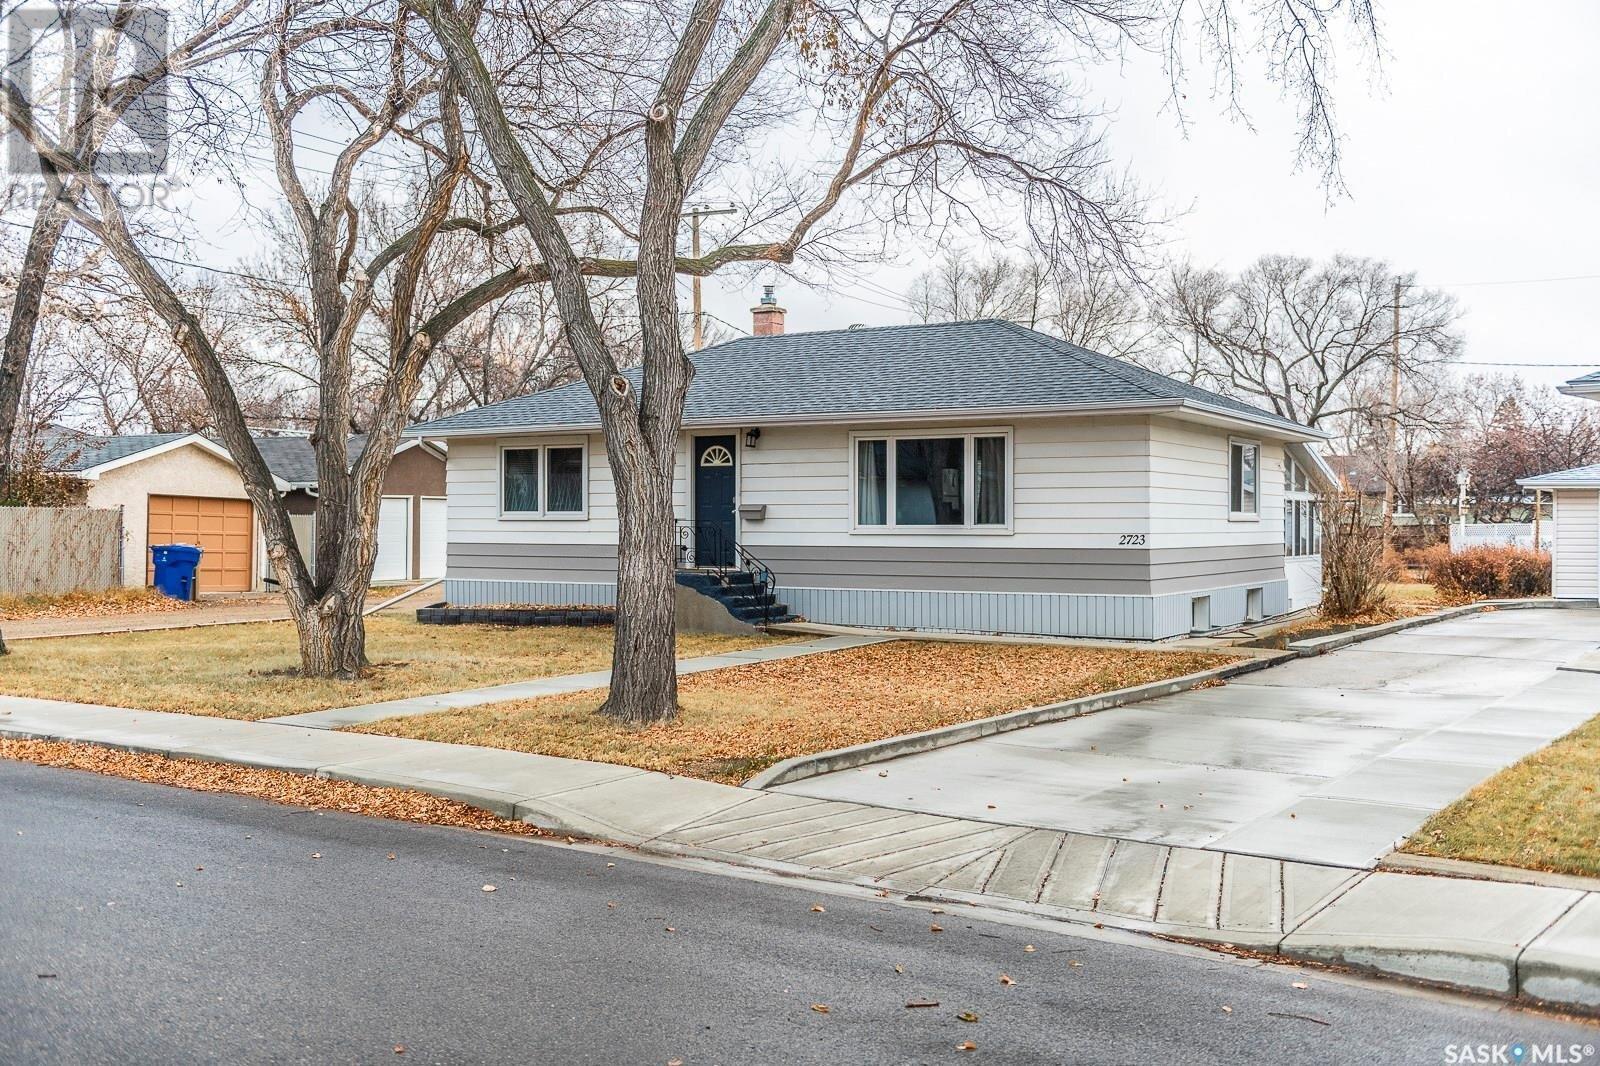 House for sale at 2723 Borden St Regina Saskatchewan - MLS: SK833231